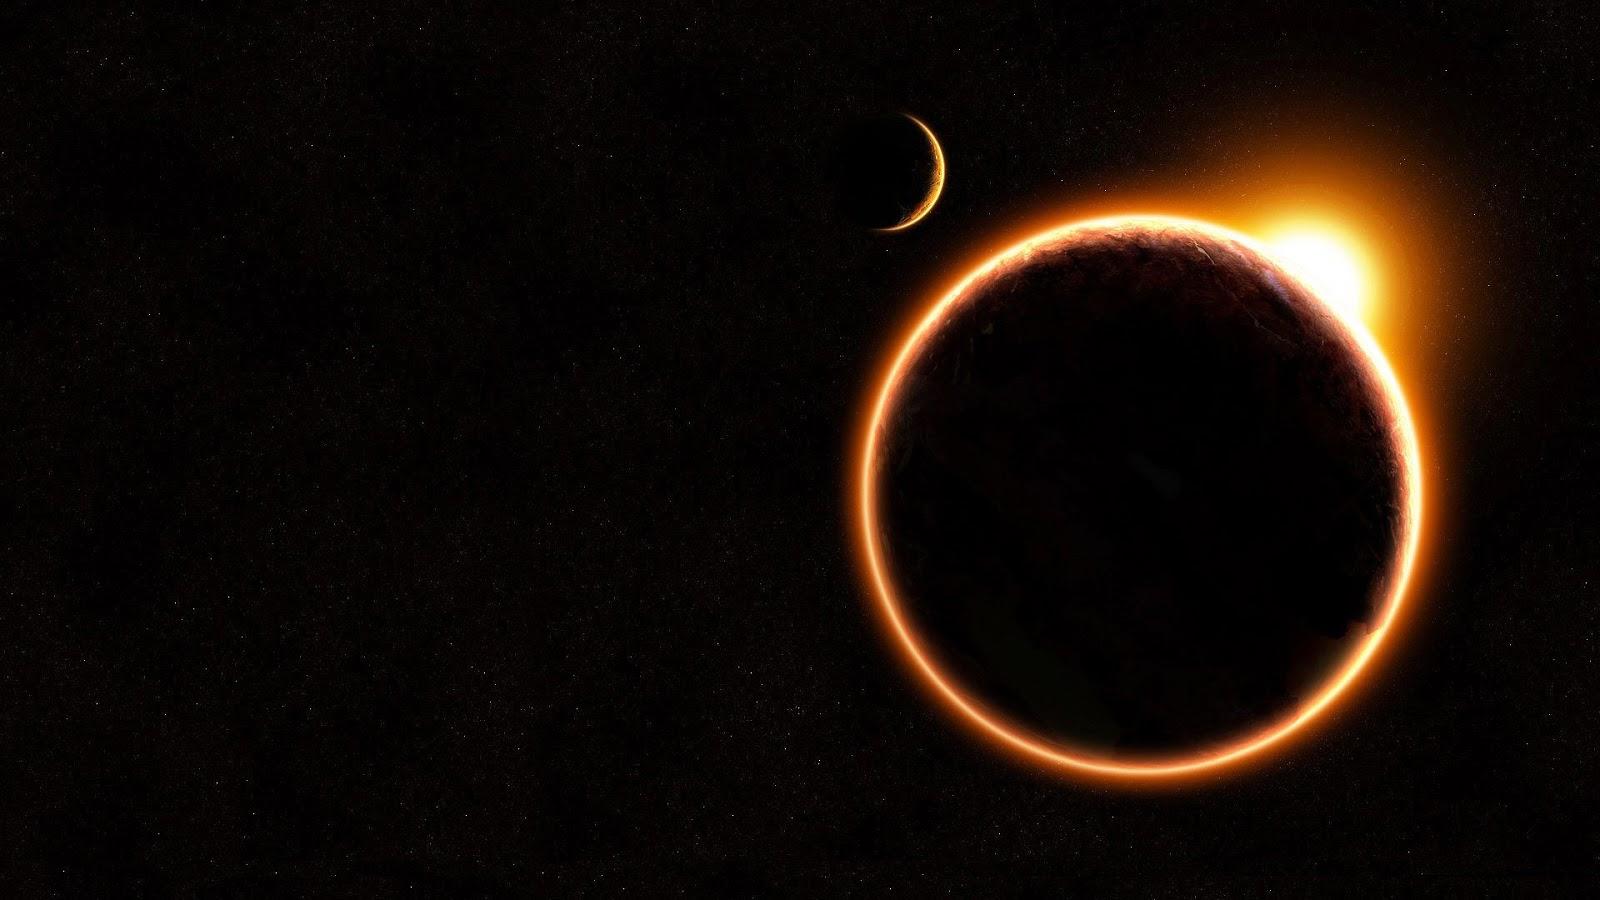 http://2.bp.blogspot.com/-SwCd3xyit5g/UIisnf4BKtI/AAAAAAAAFD0/dIKmpS5q40U/s1600/moon-eclipse-space.jpg